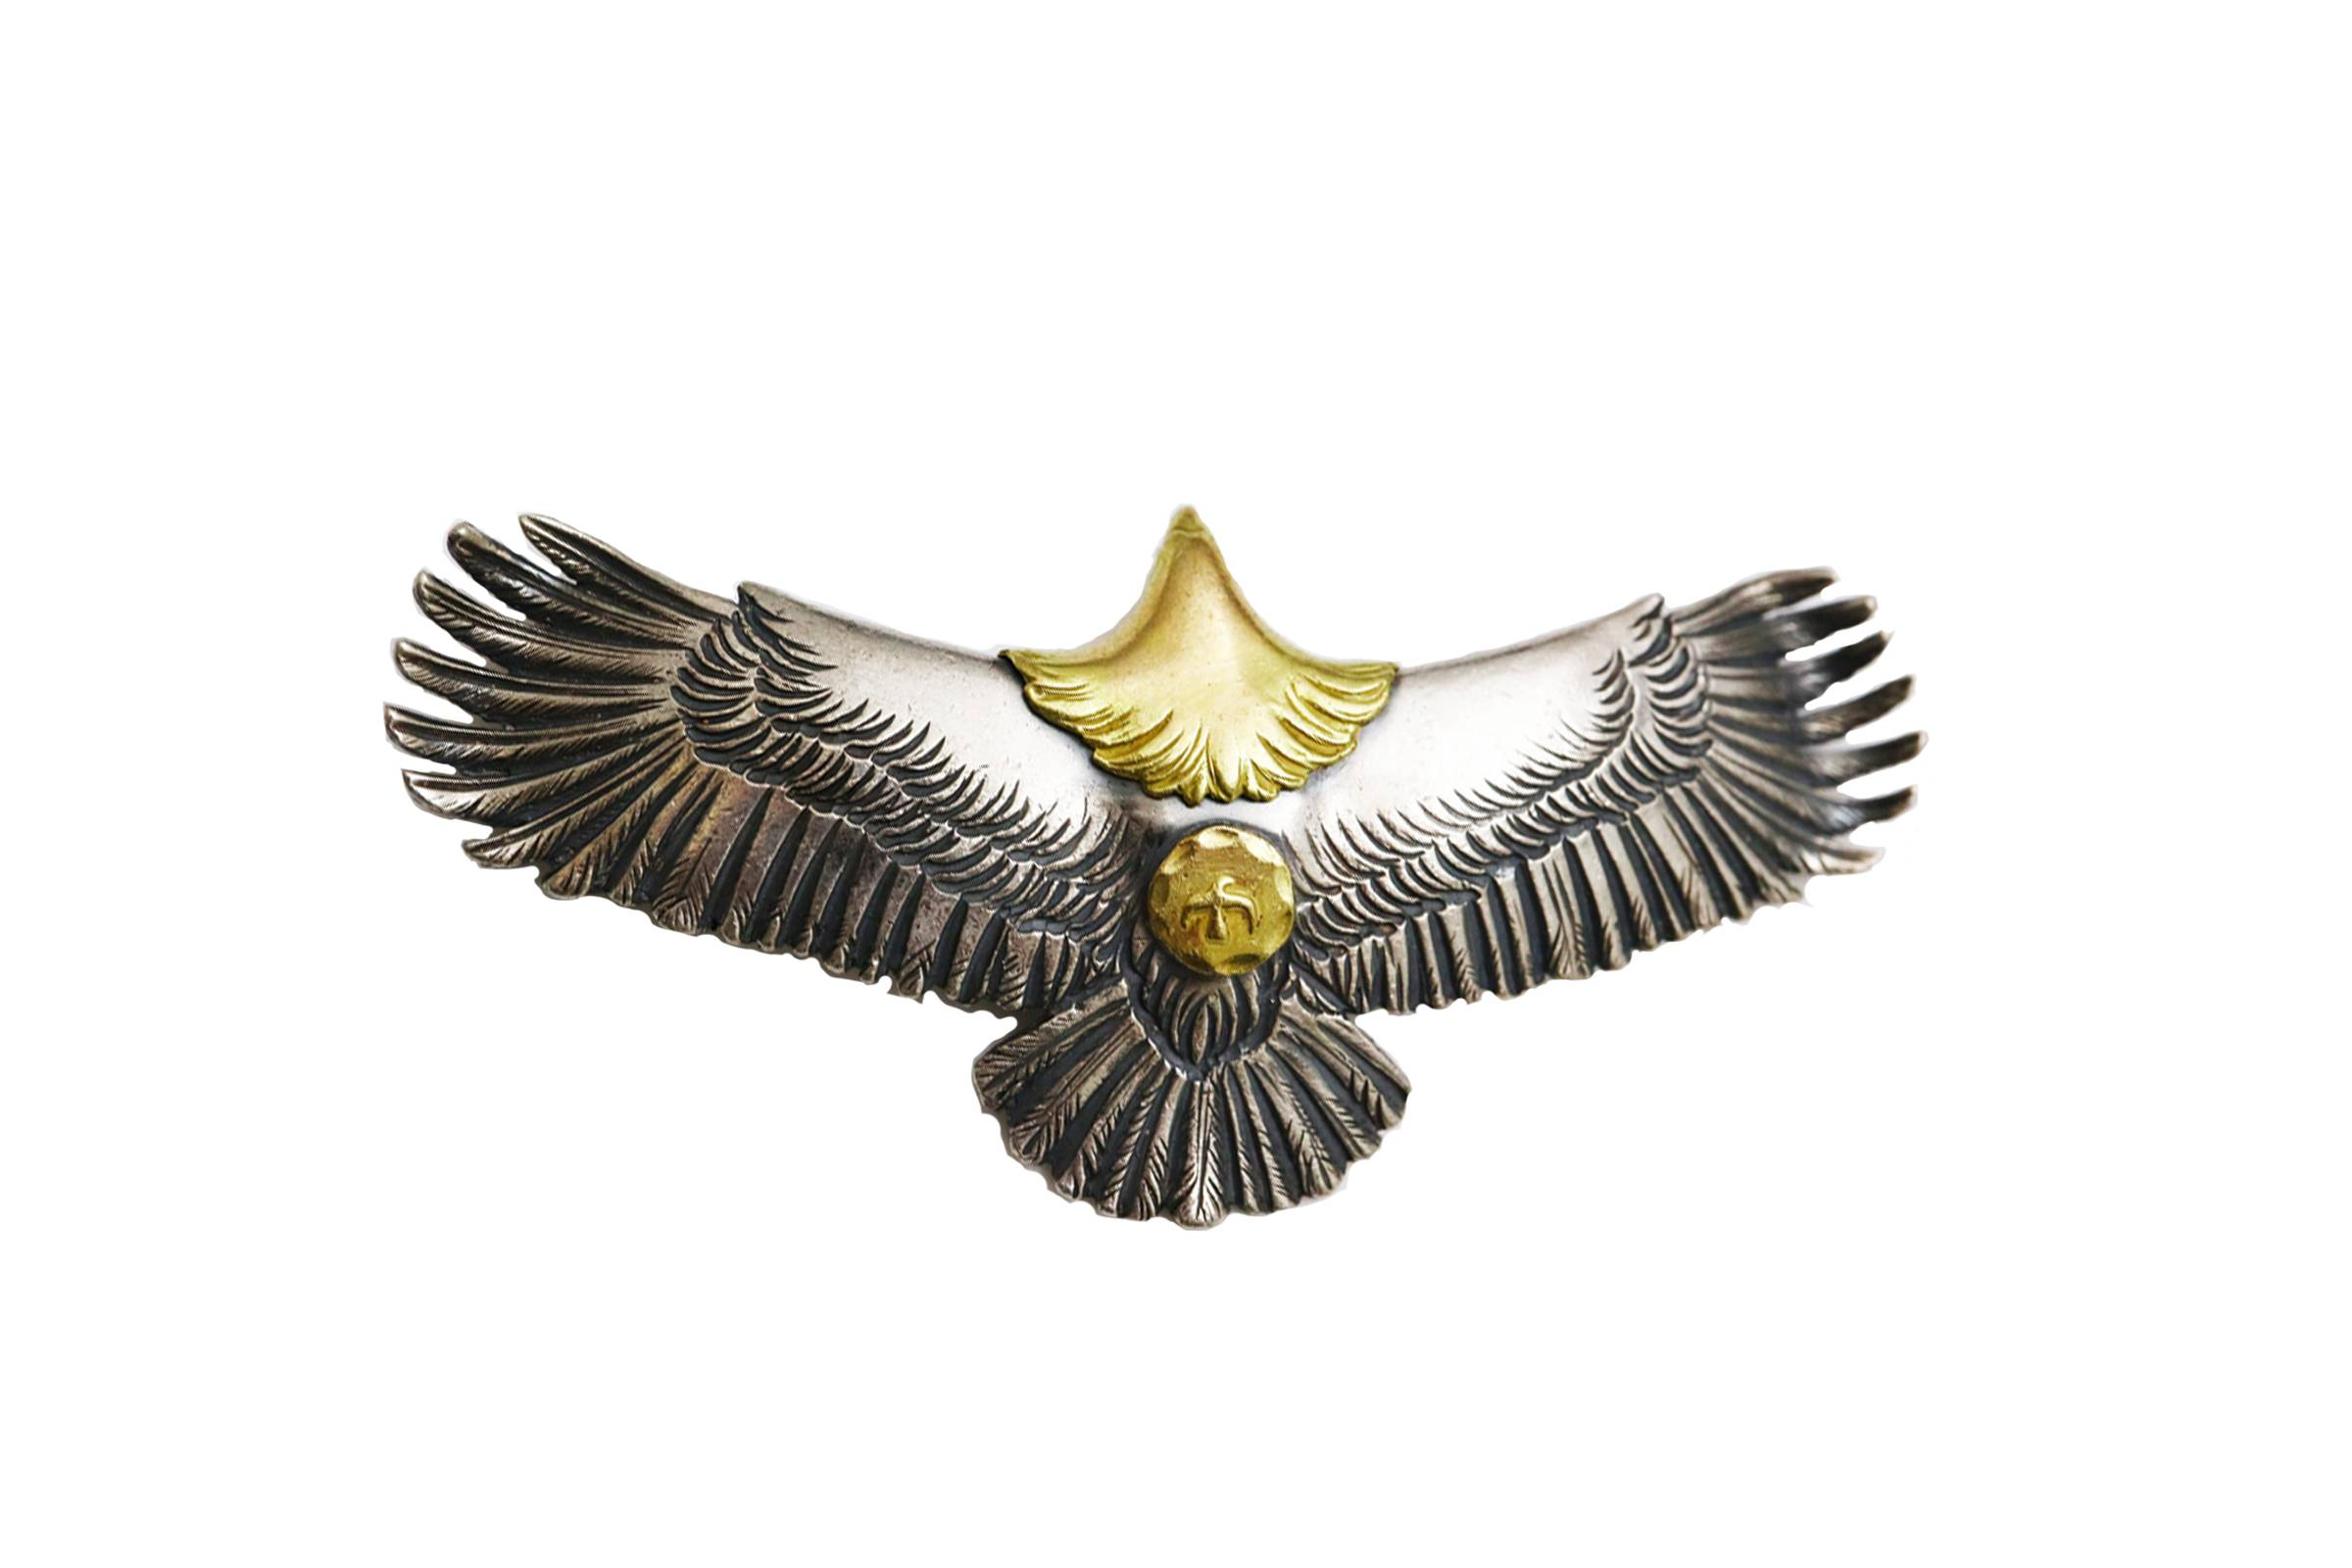 Goro's Eagle Pendant